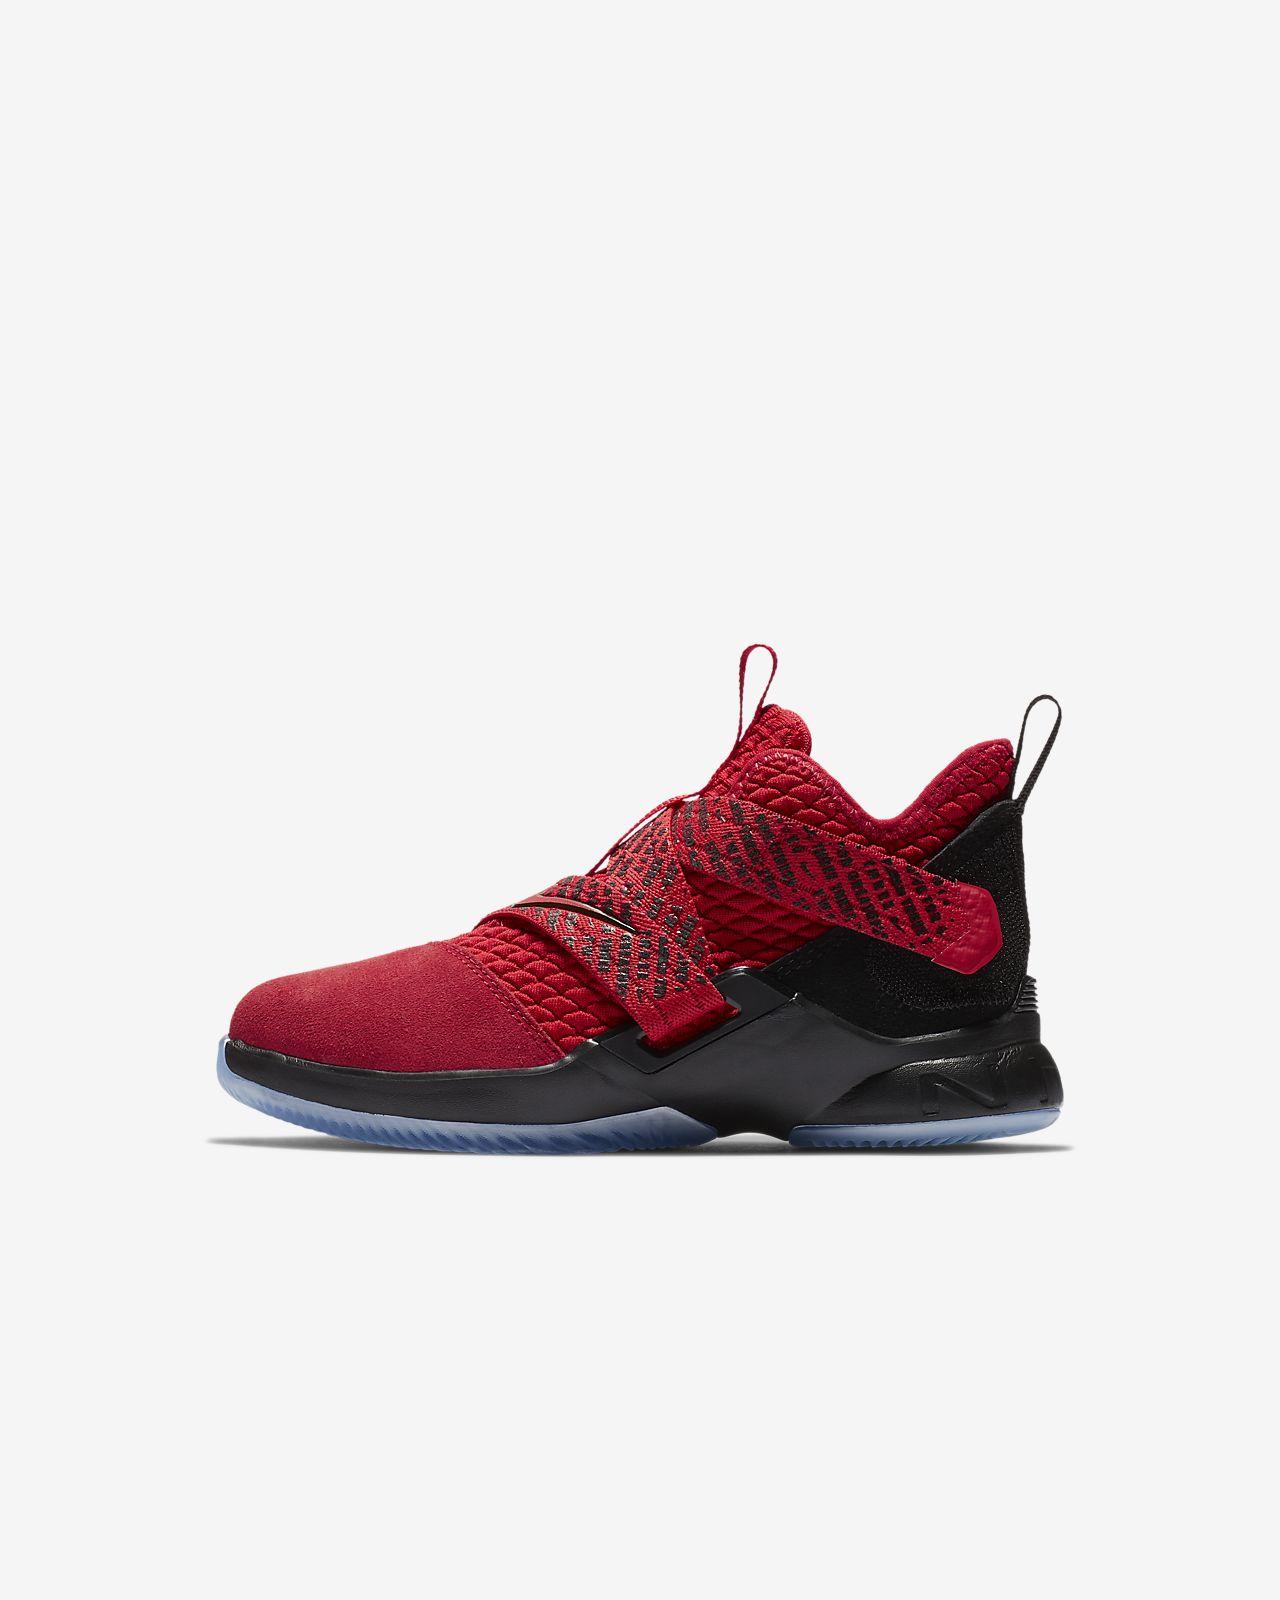 online store 94336 297fb ... LeBron Soldier 12 Little Kids  Shoe